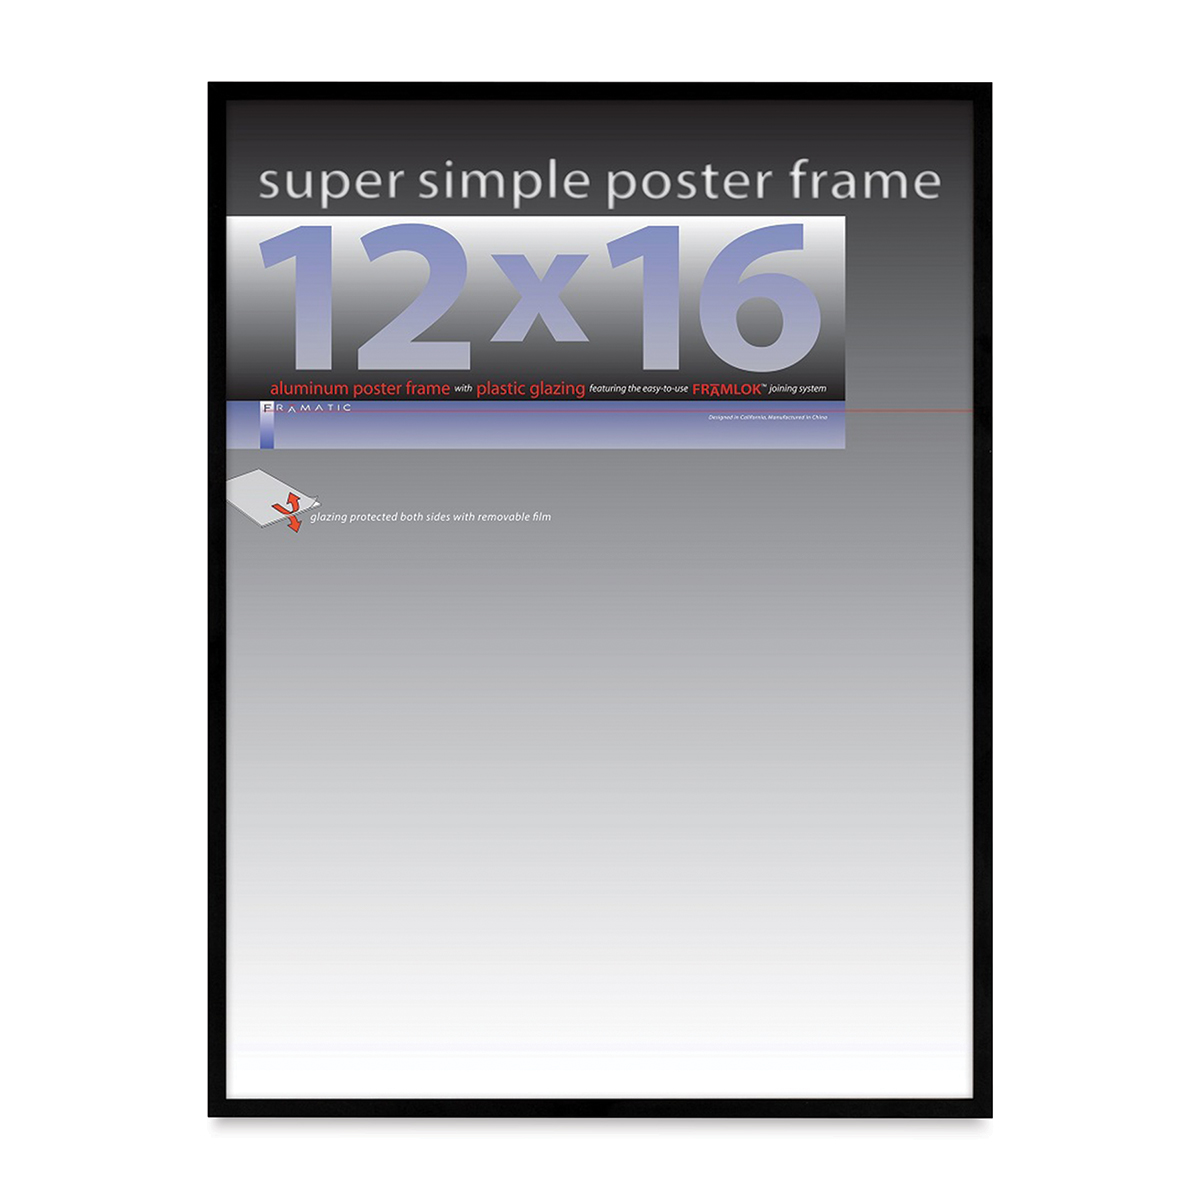 Framatic Super Simple Poster Frame - Black, 12 x 16